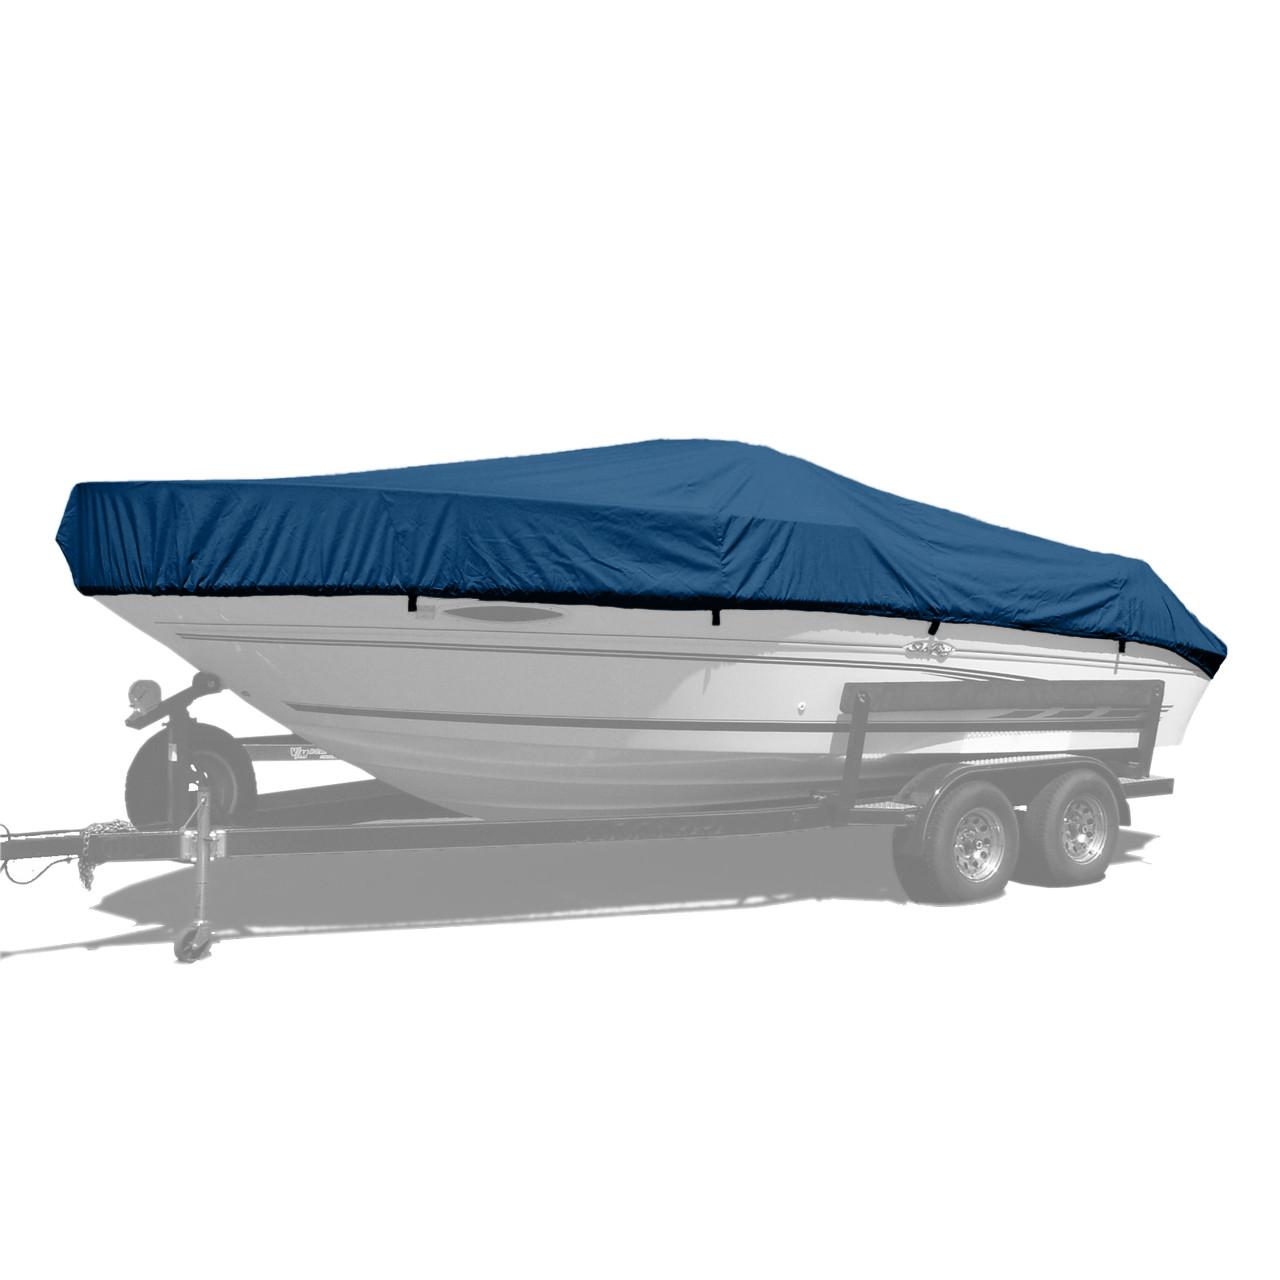 Nitro 640 LX Custom Boat Cover | Westland | TR16101